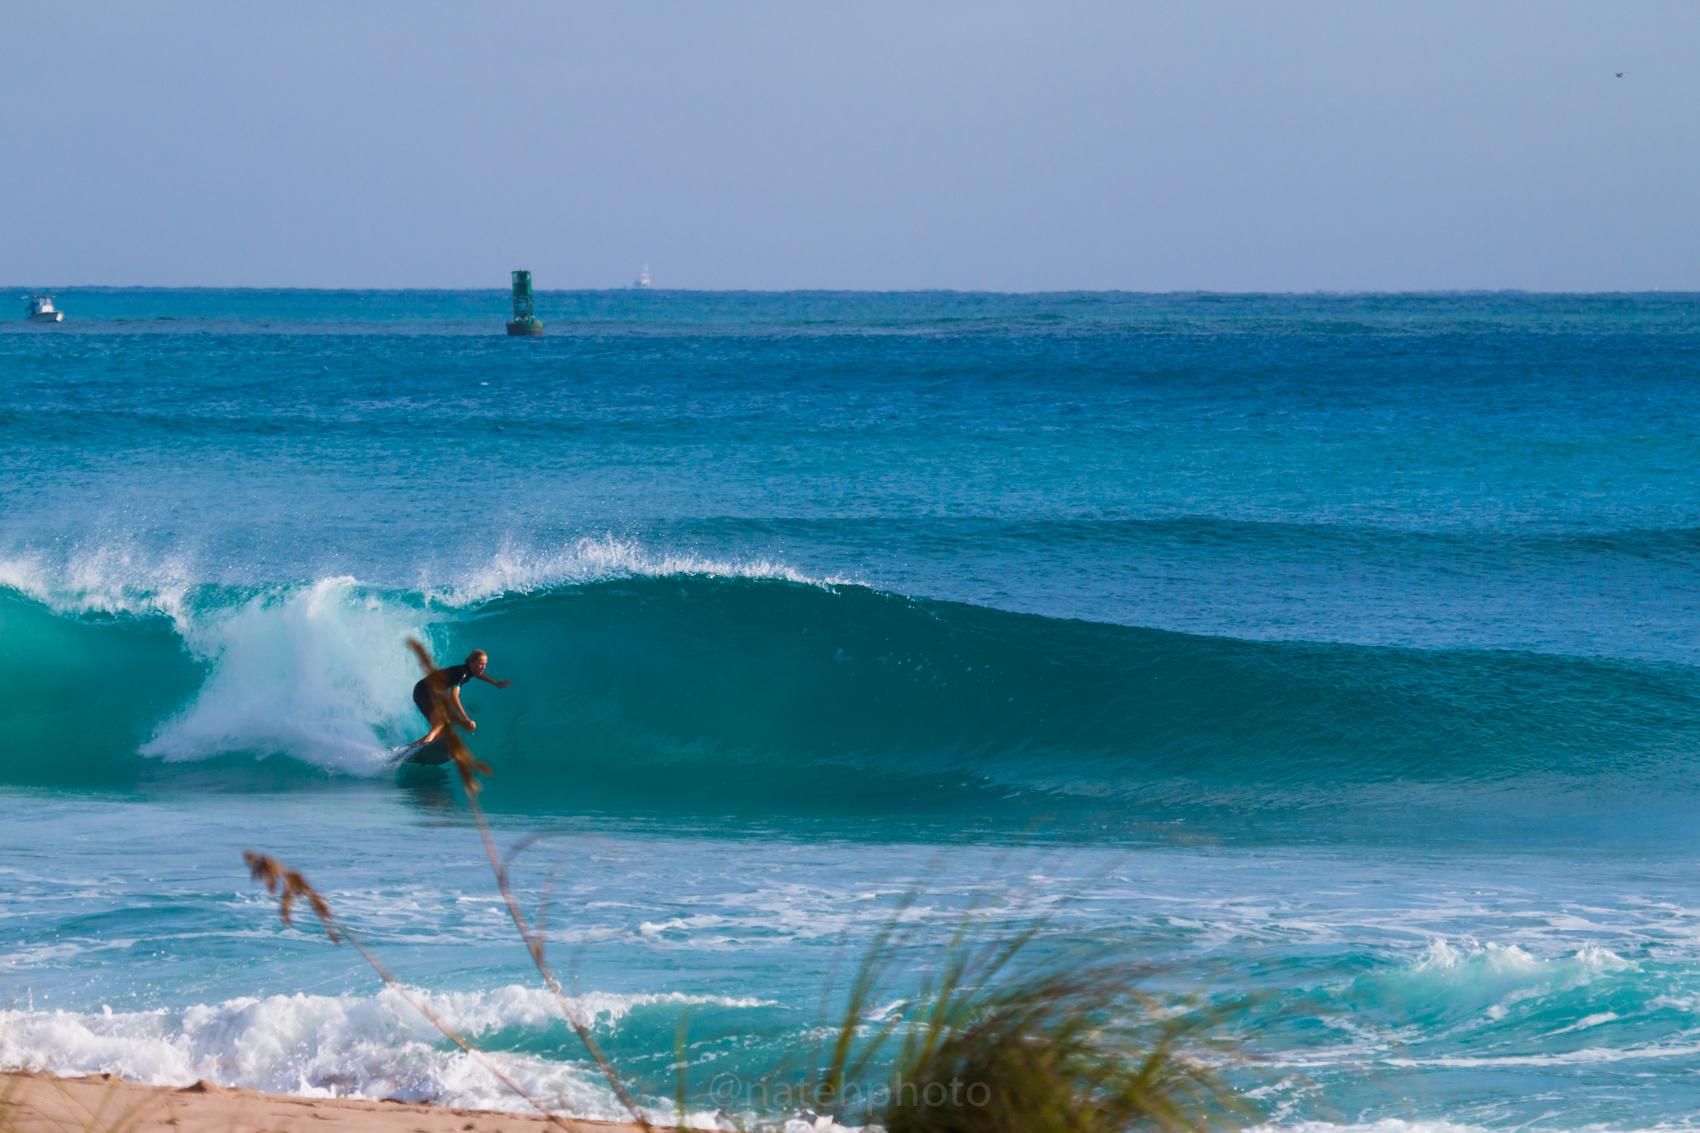 JanuarySwell_ReefRoad_Florida_natehphoto-4261.jpg